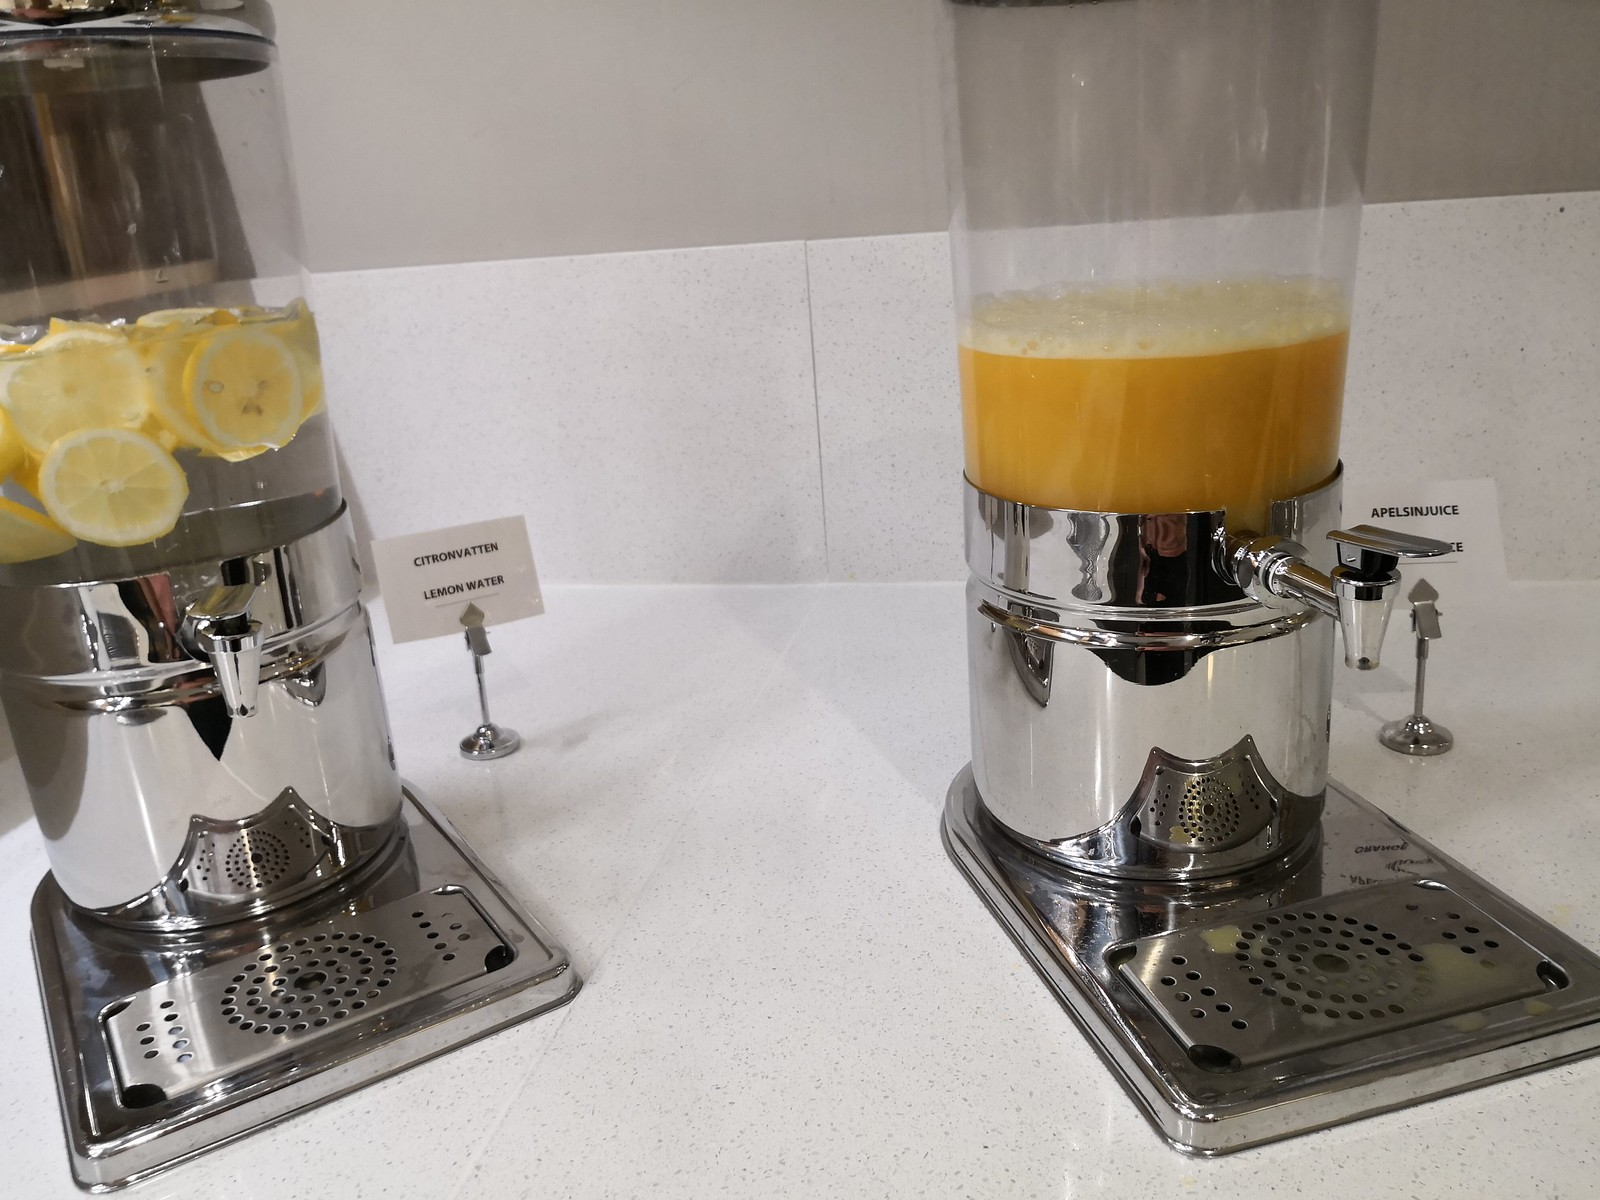 Juice and lemon water